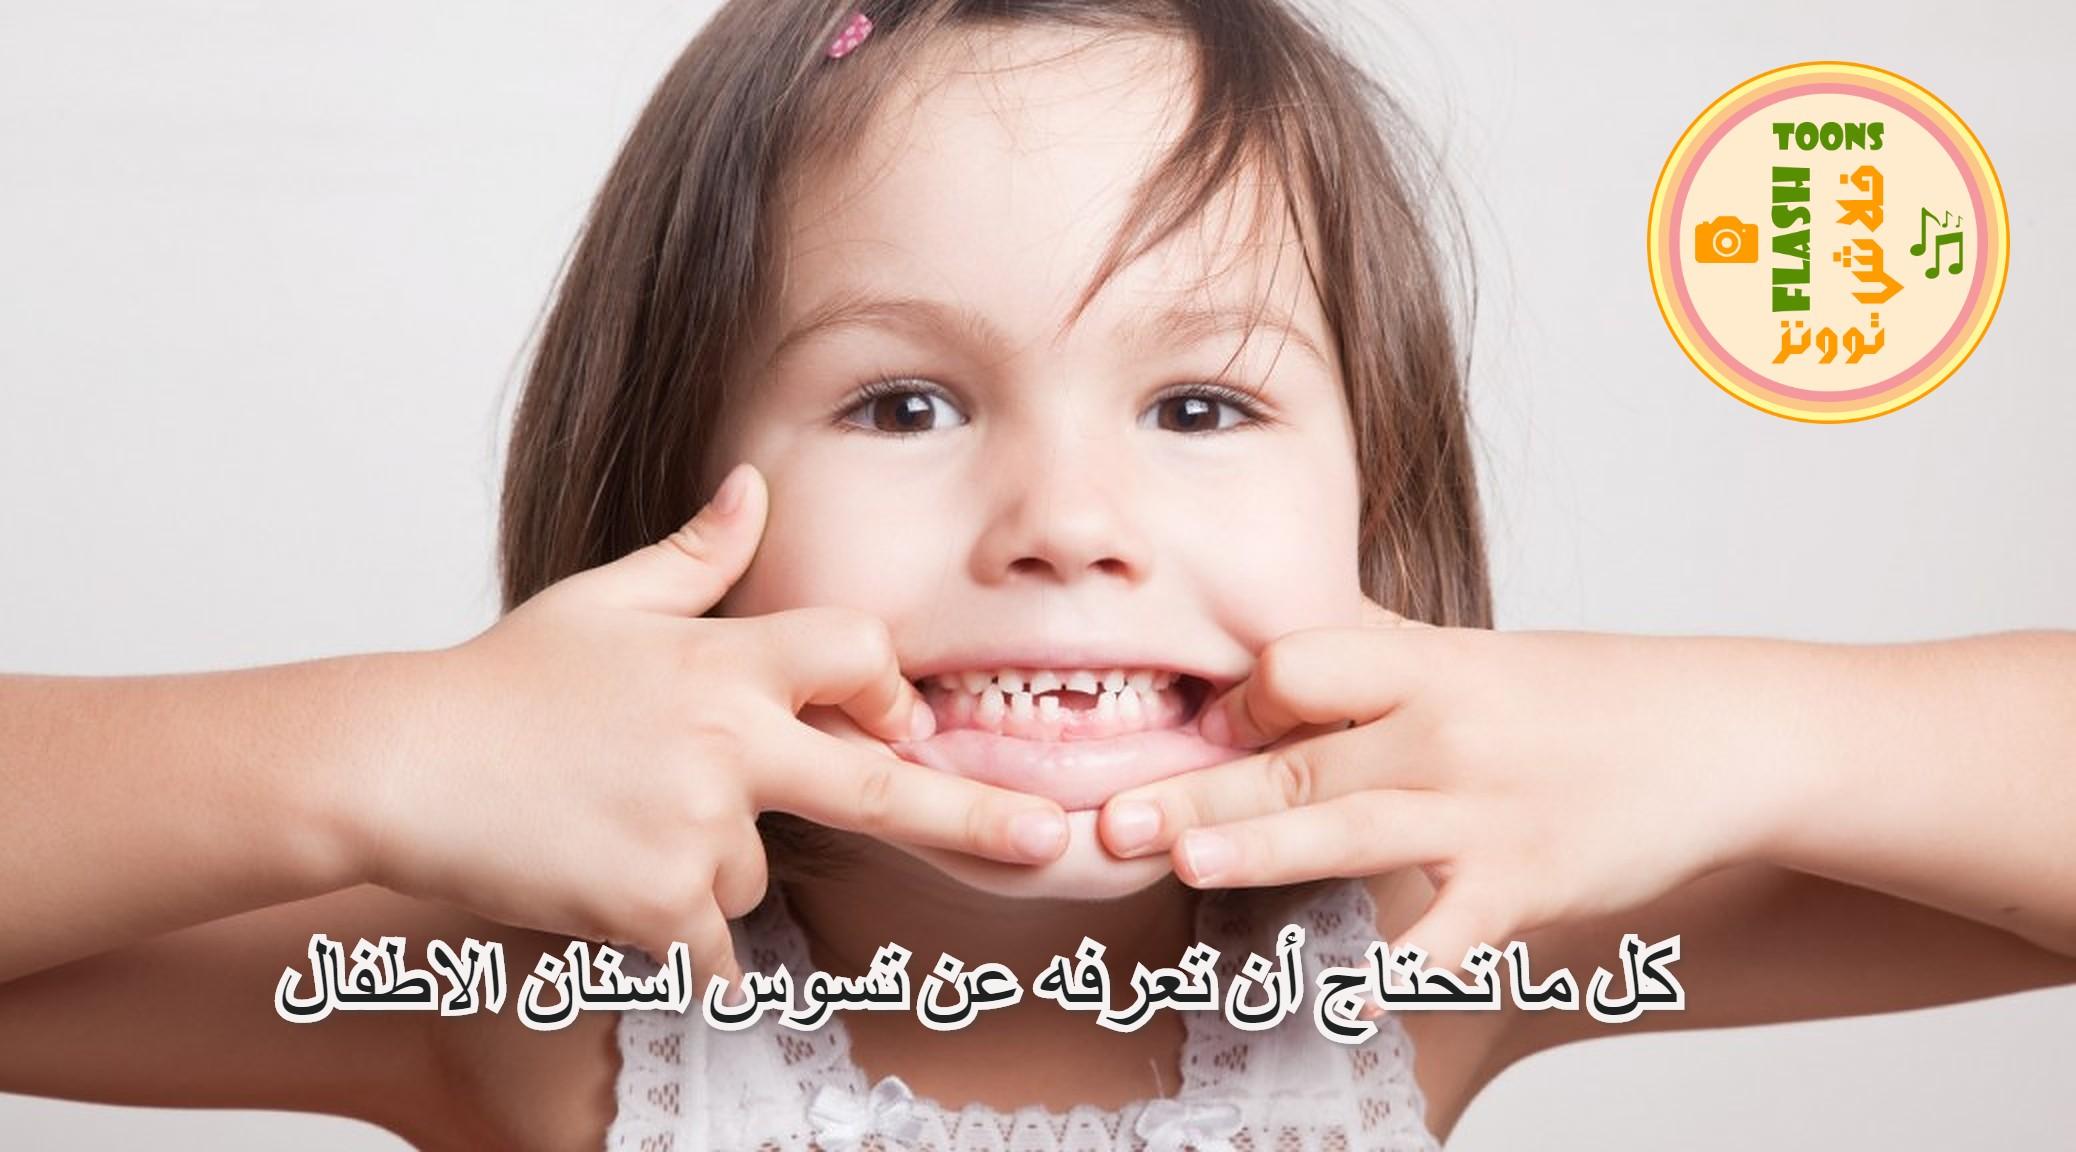 تسوس اسنان الاطفال